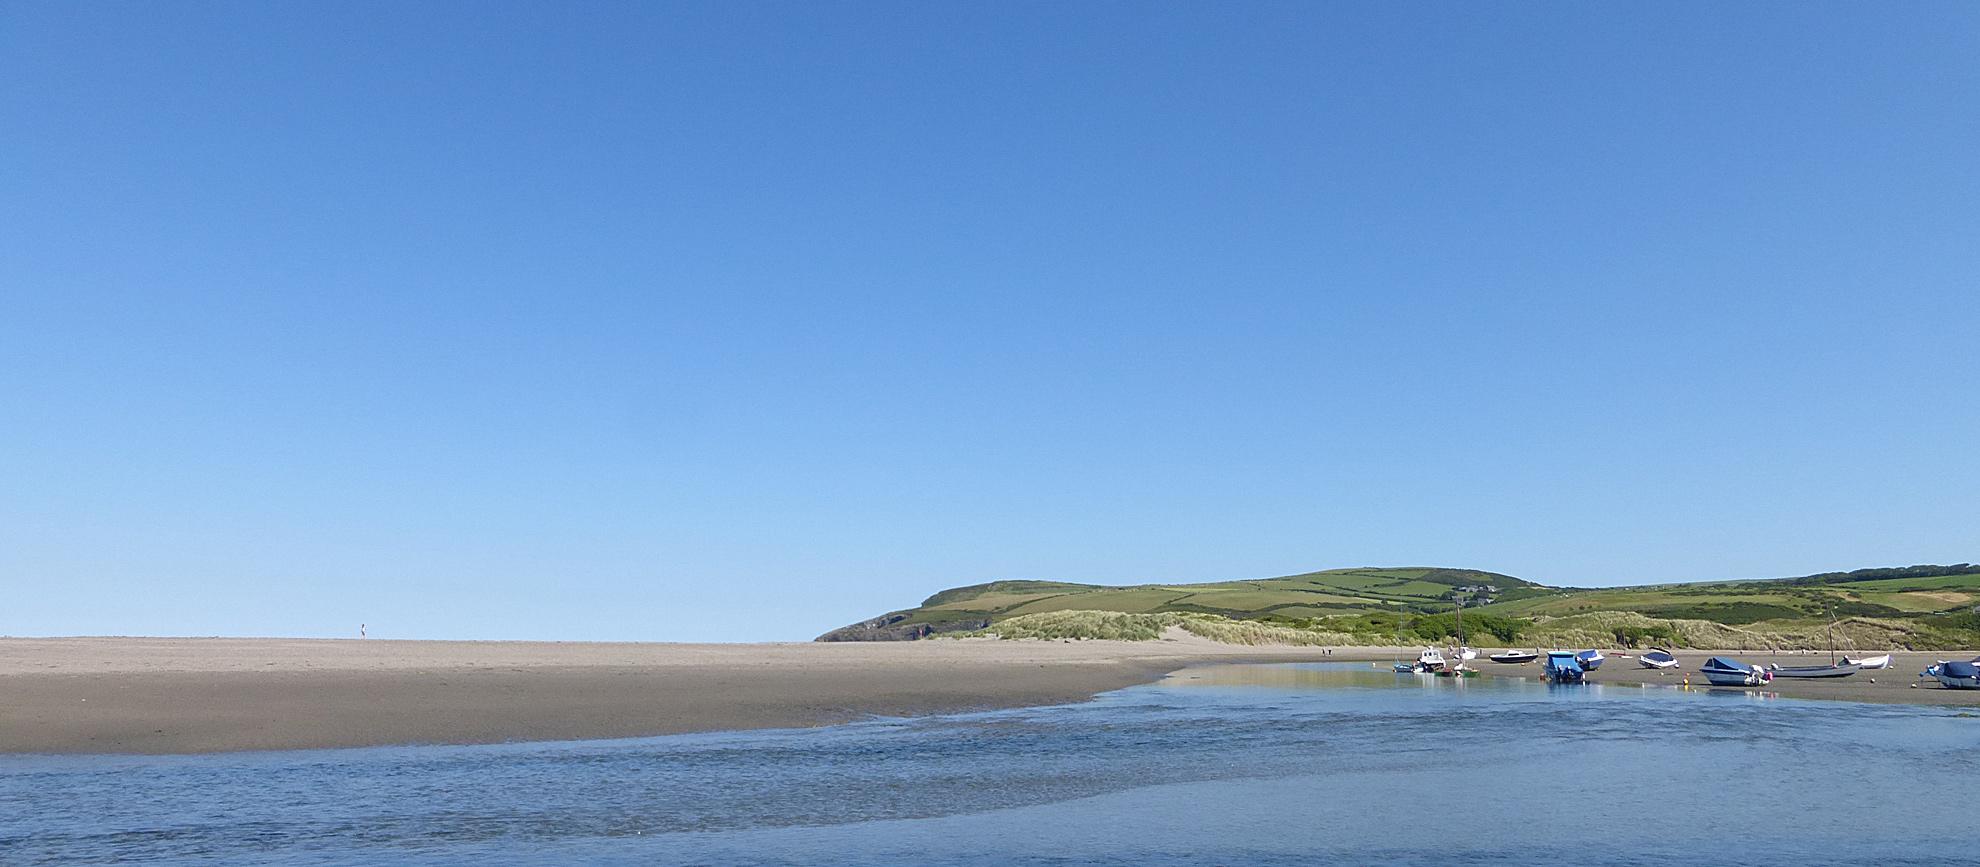 The beach at Newport Pembrokeshire